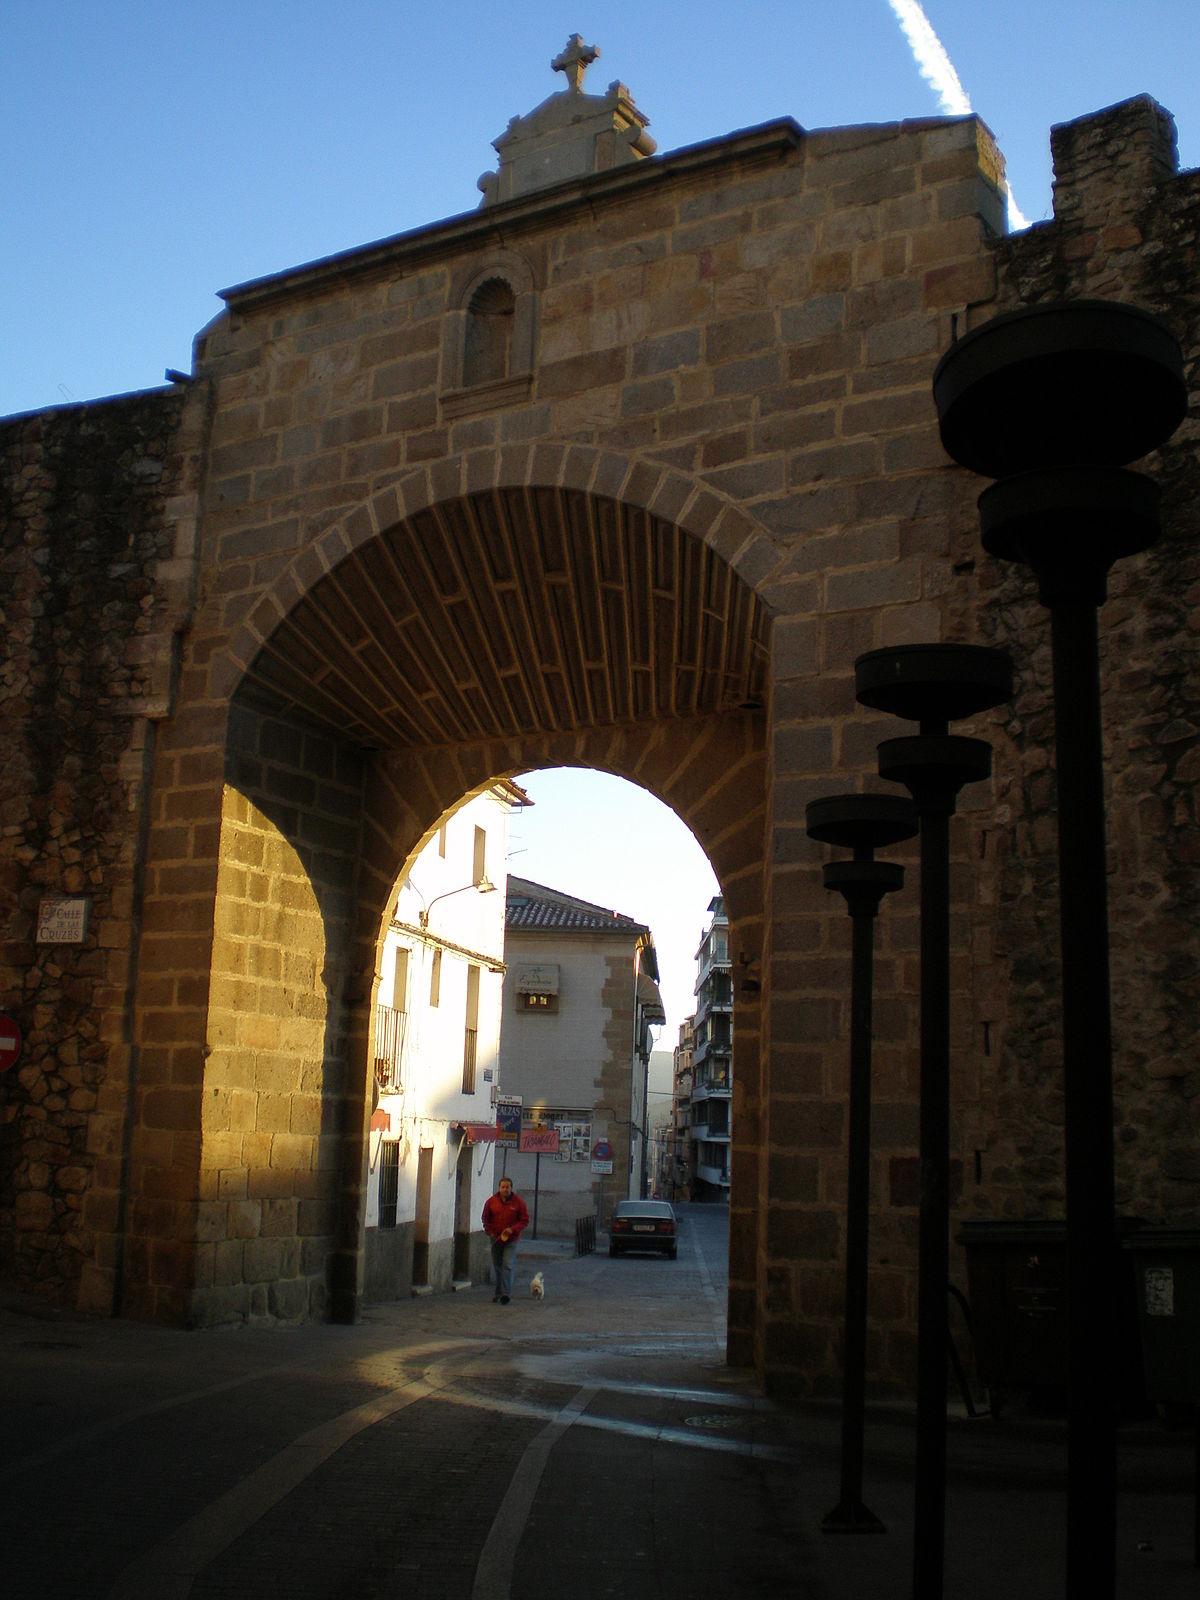 Puerta de sol plasencia wikipedia la enciclopedia libre for Puerta de sol en directo